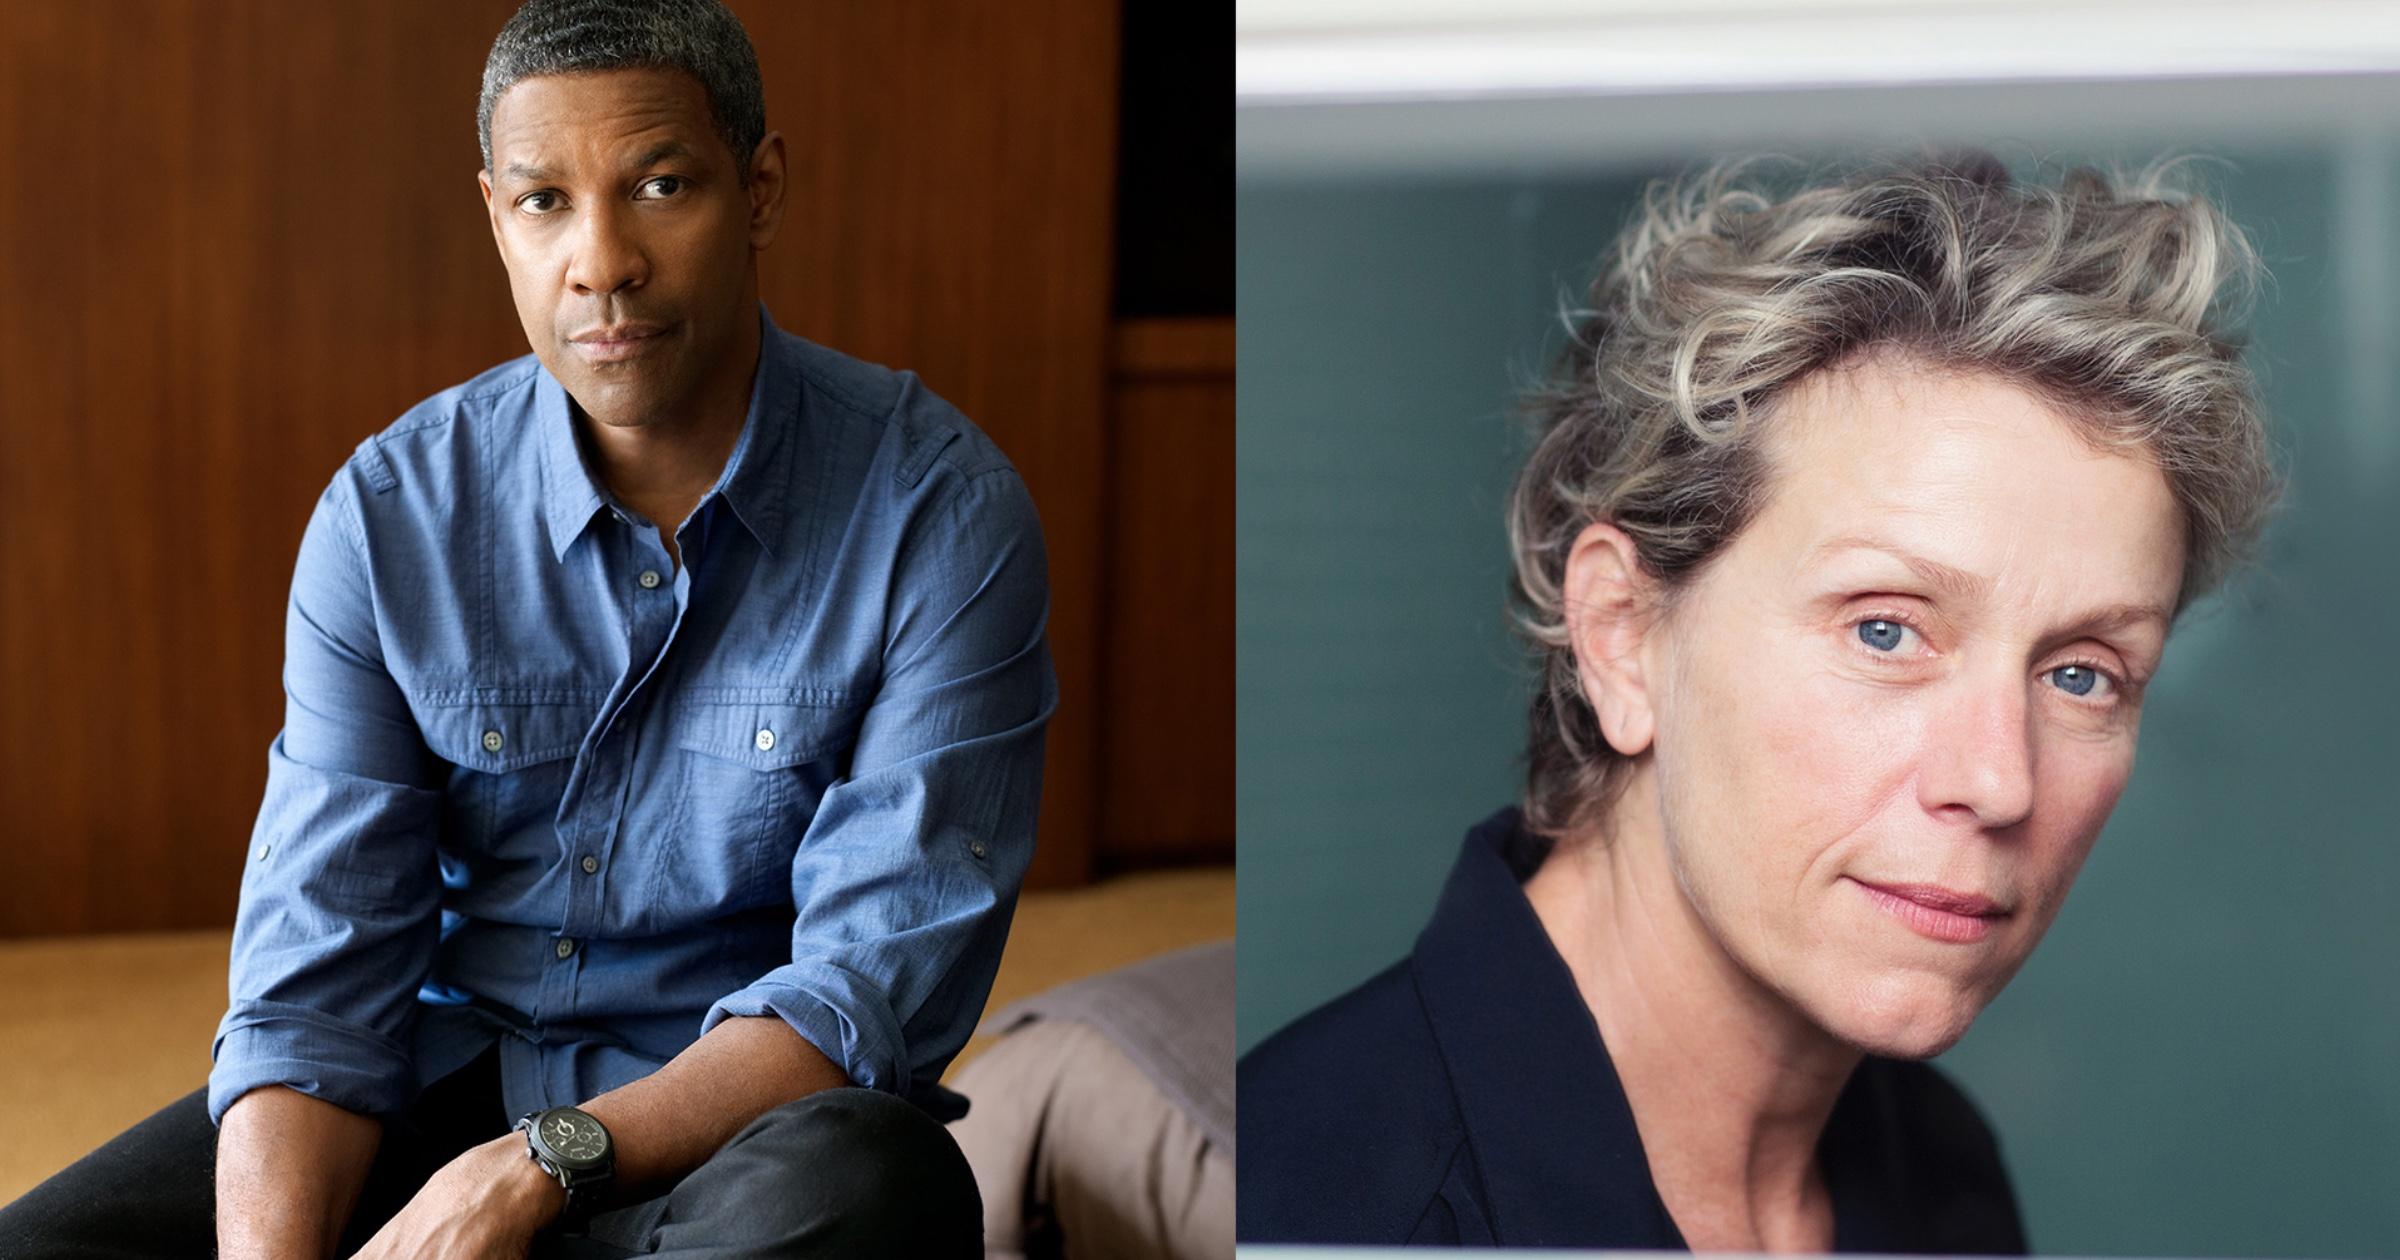 Denzel Washington Frances McDormand in Tragedy of Macbeth on Apple TV+